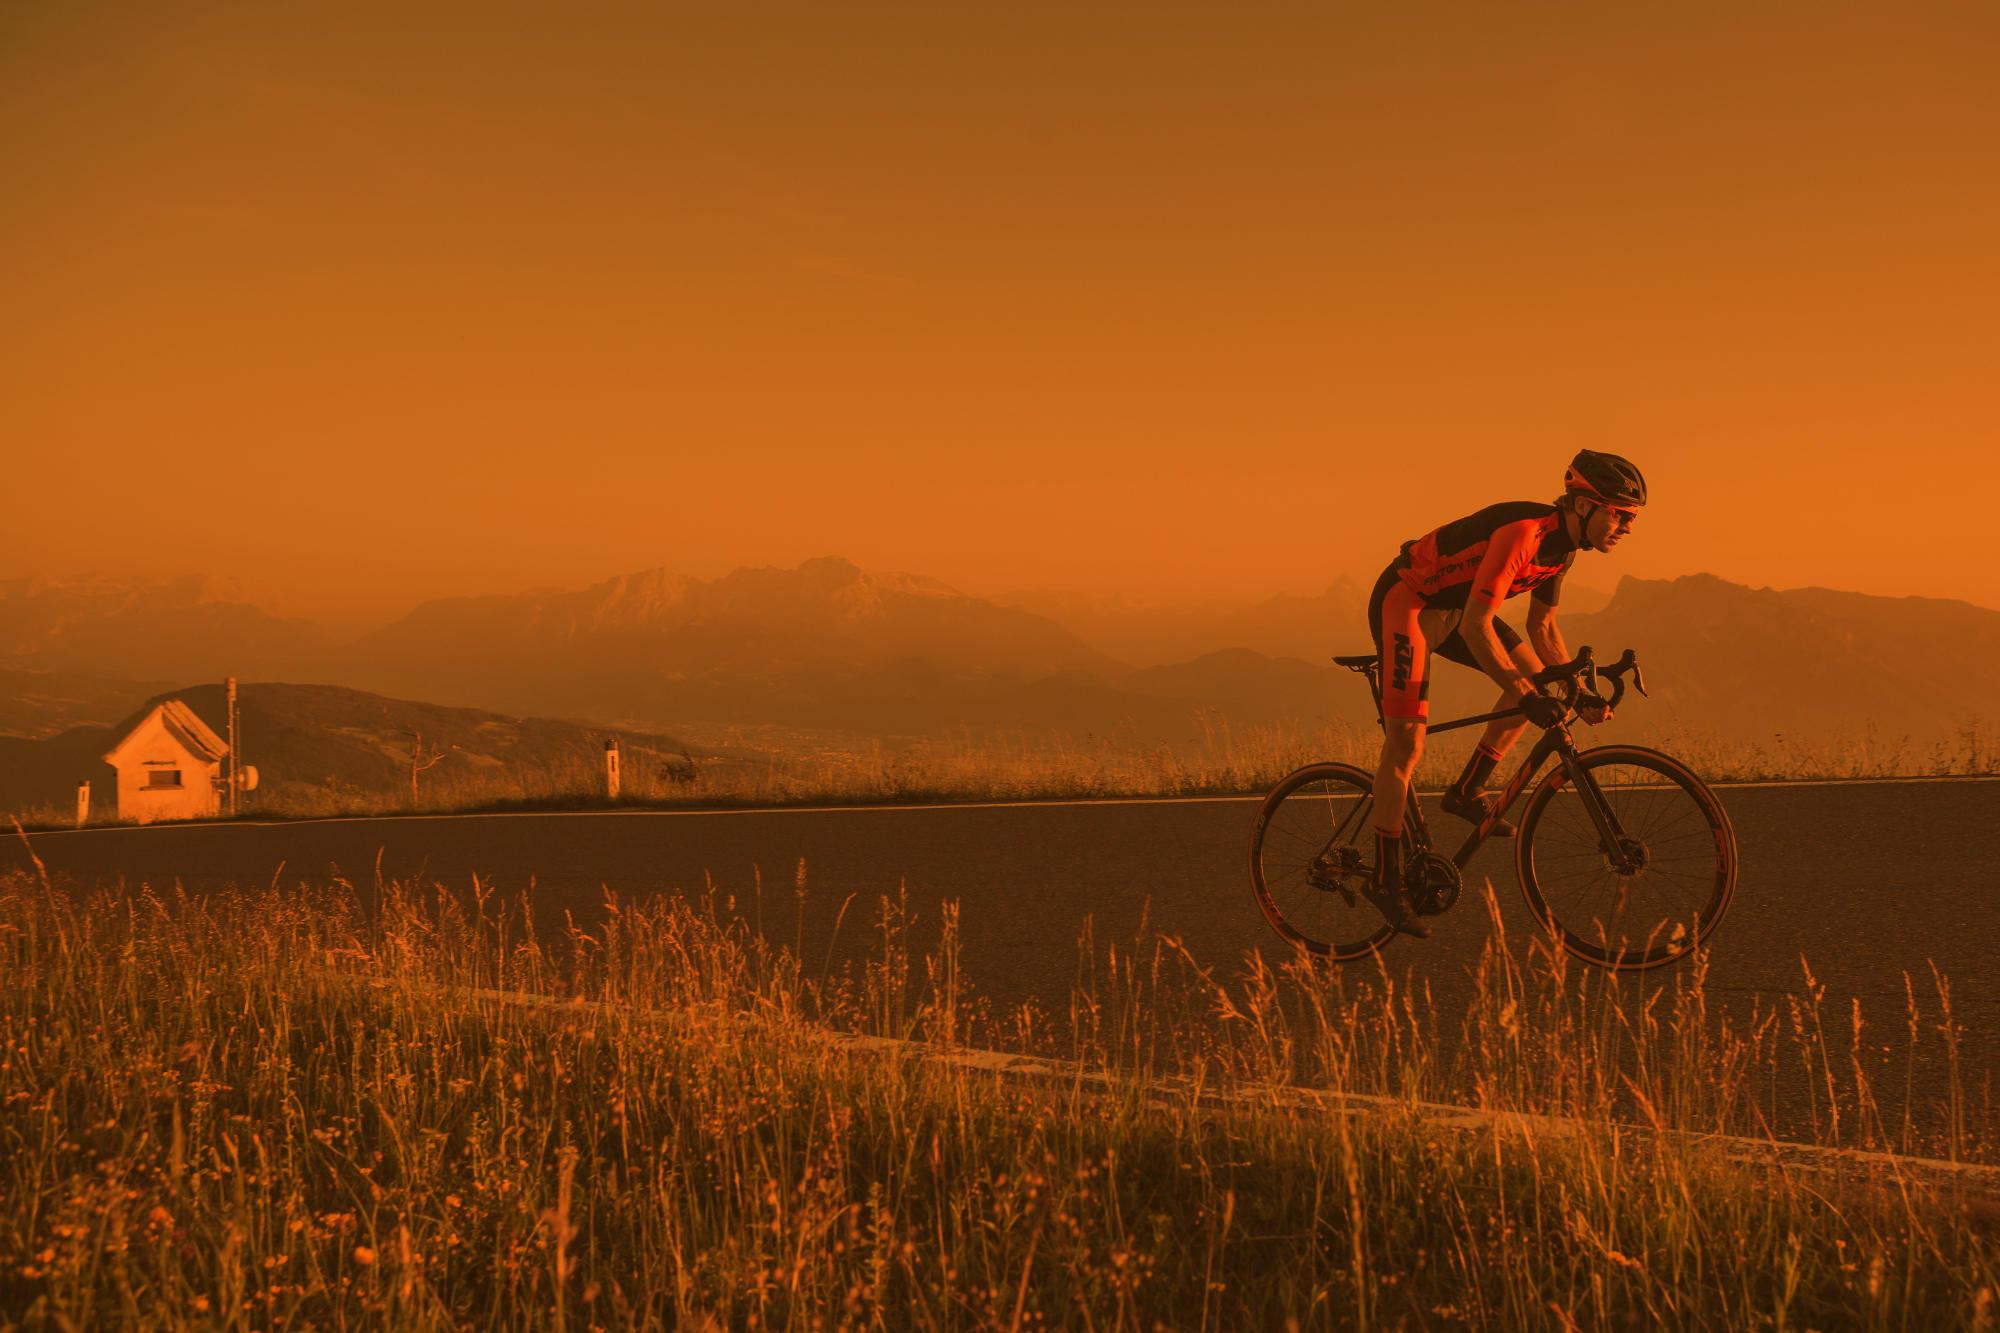 KTM Bike mit Berglandschaft